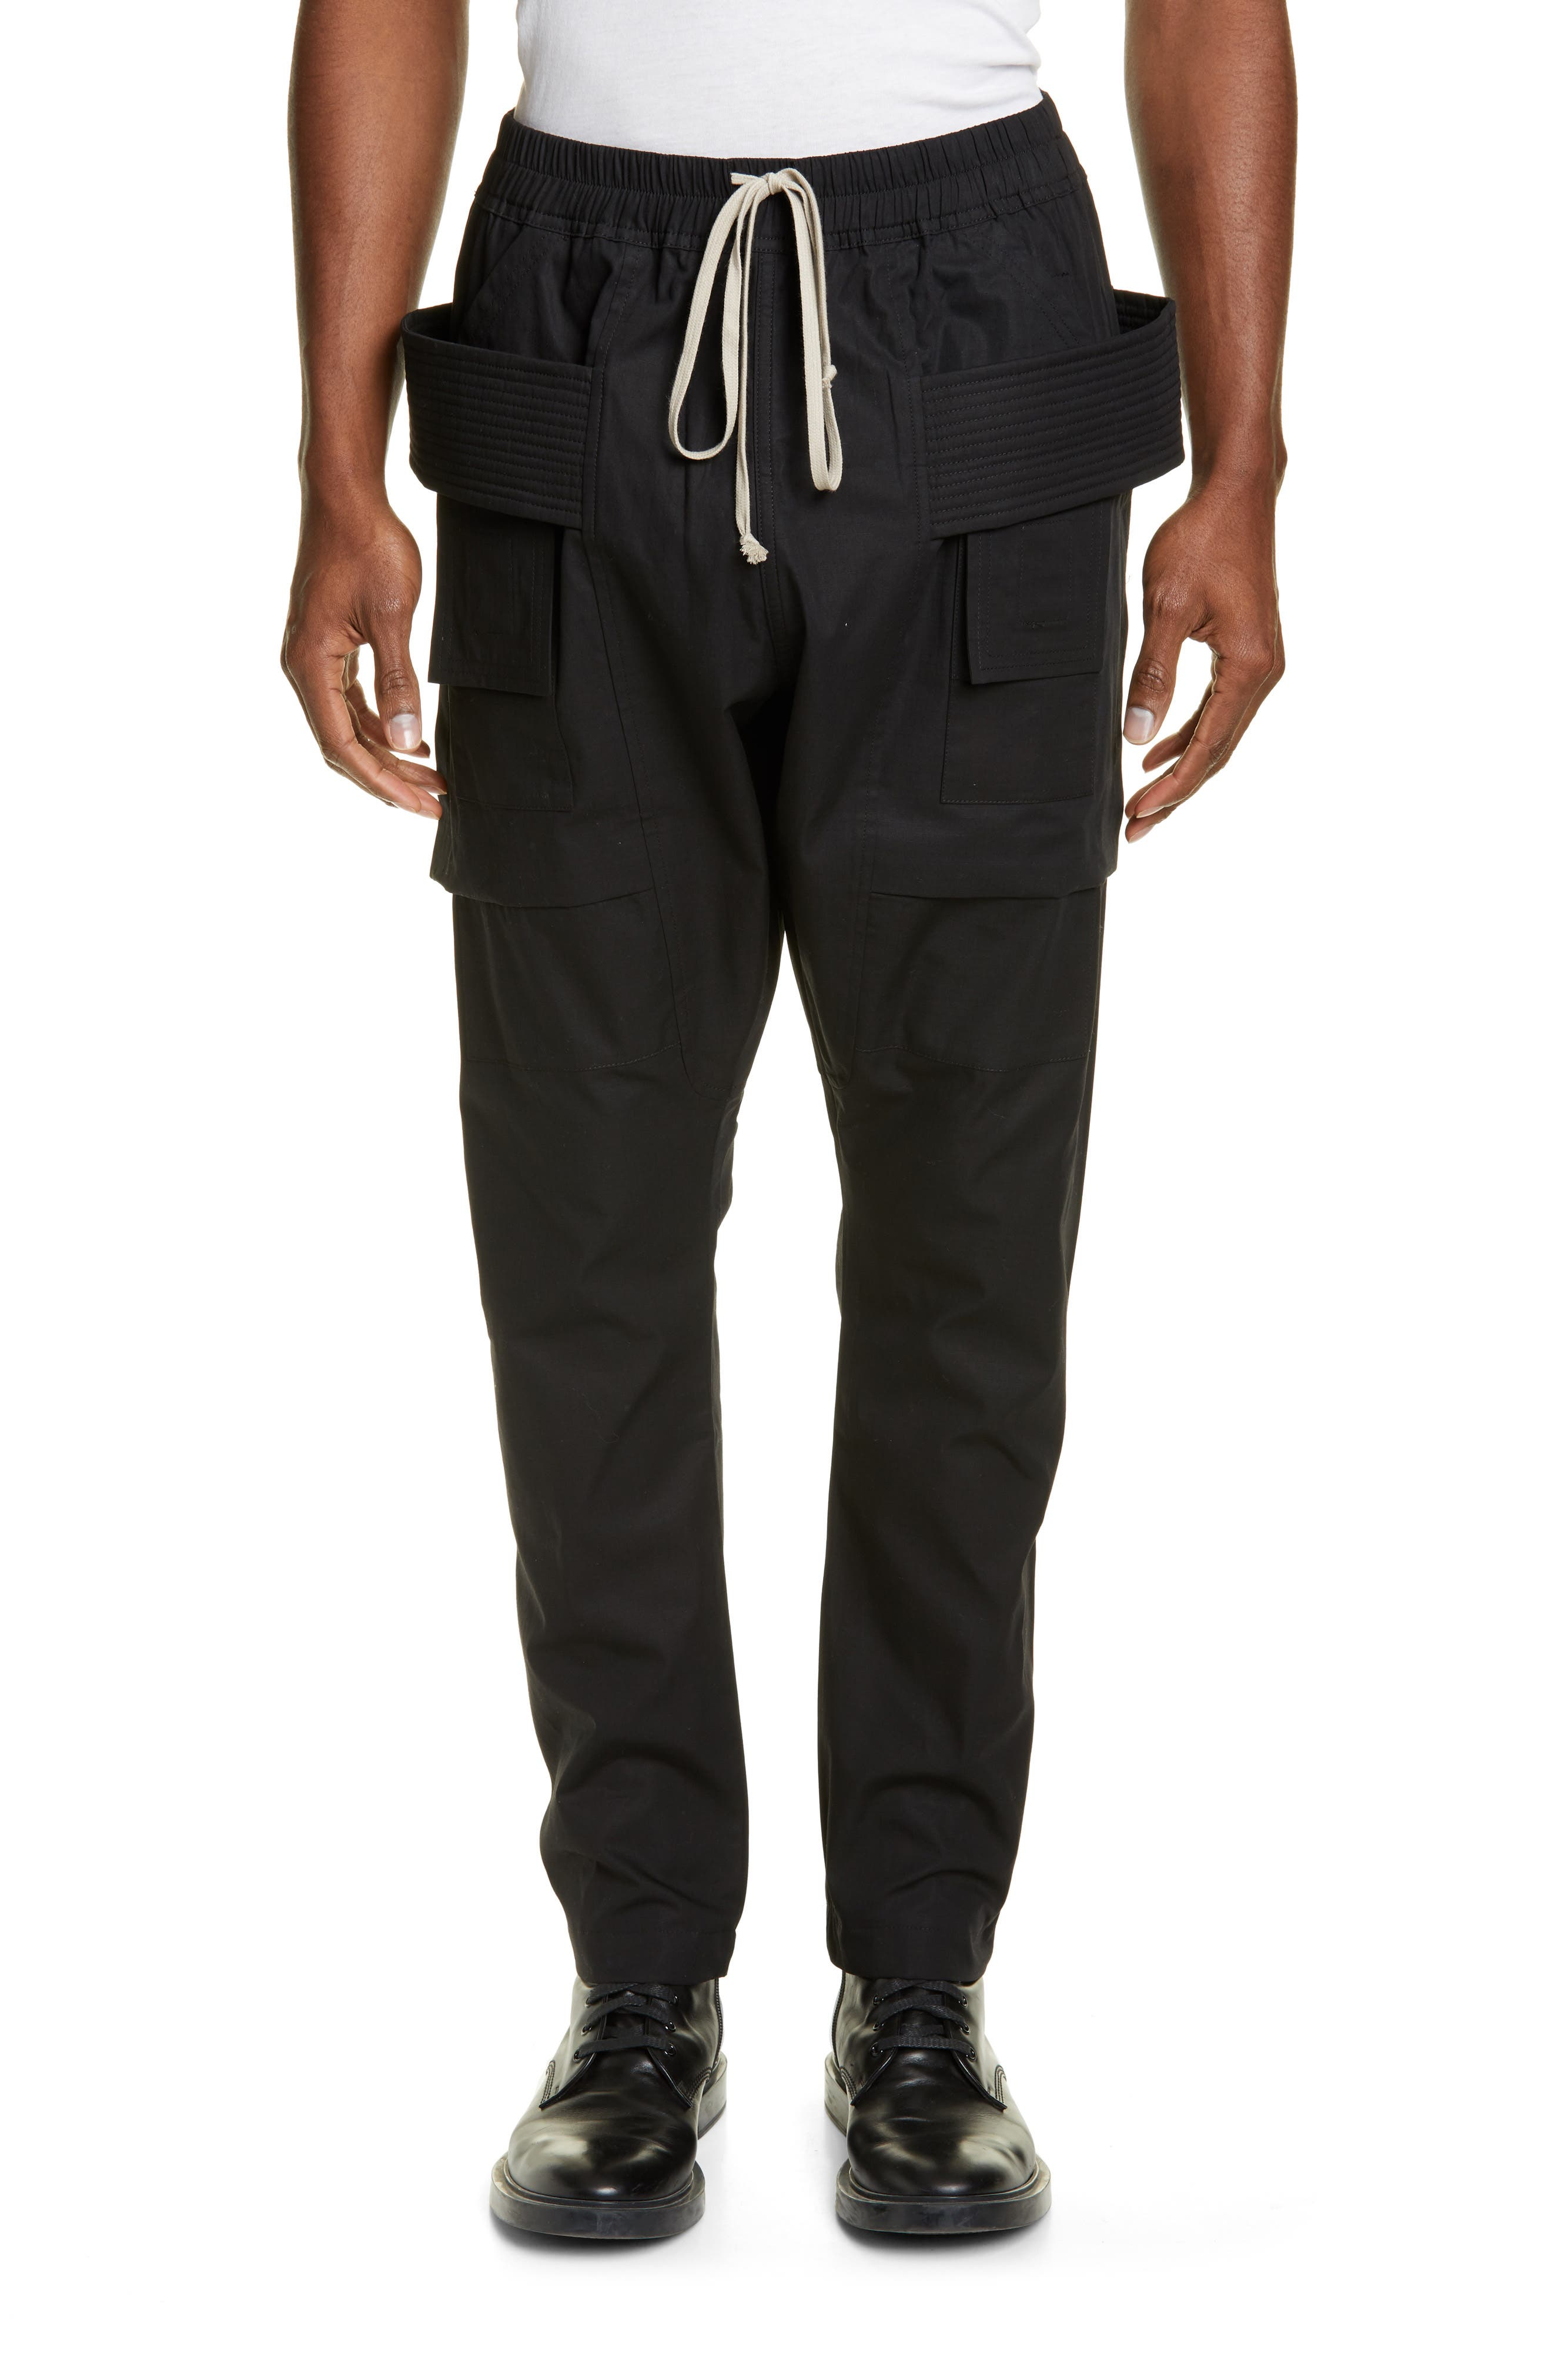 Rick Owens Drkshdw Creatch Ripstop Cargo Pants, Black